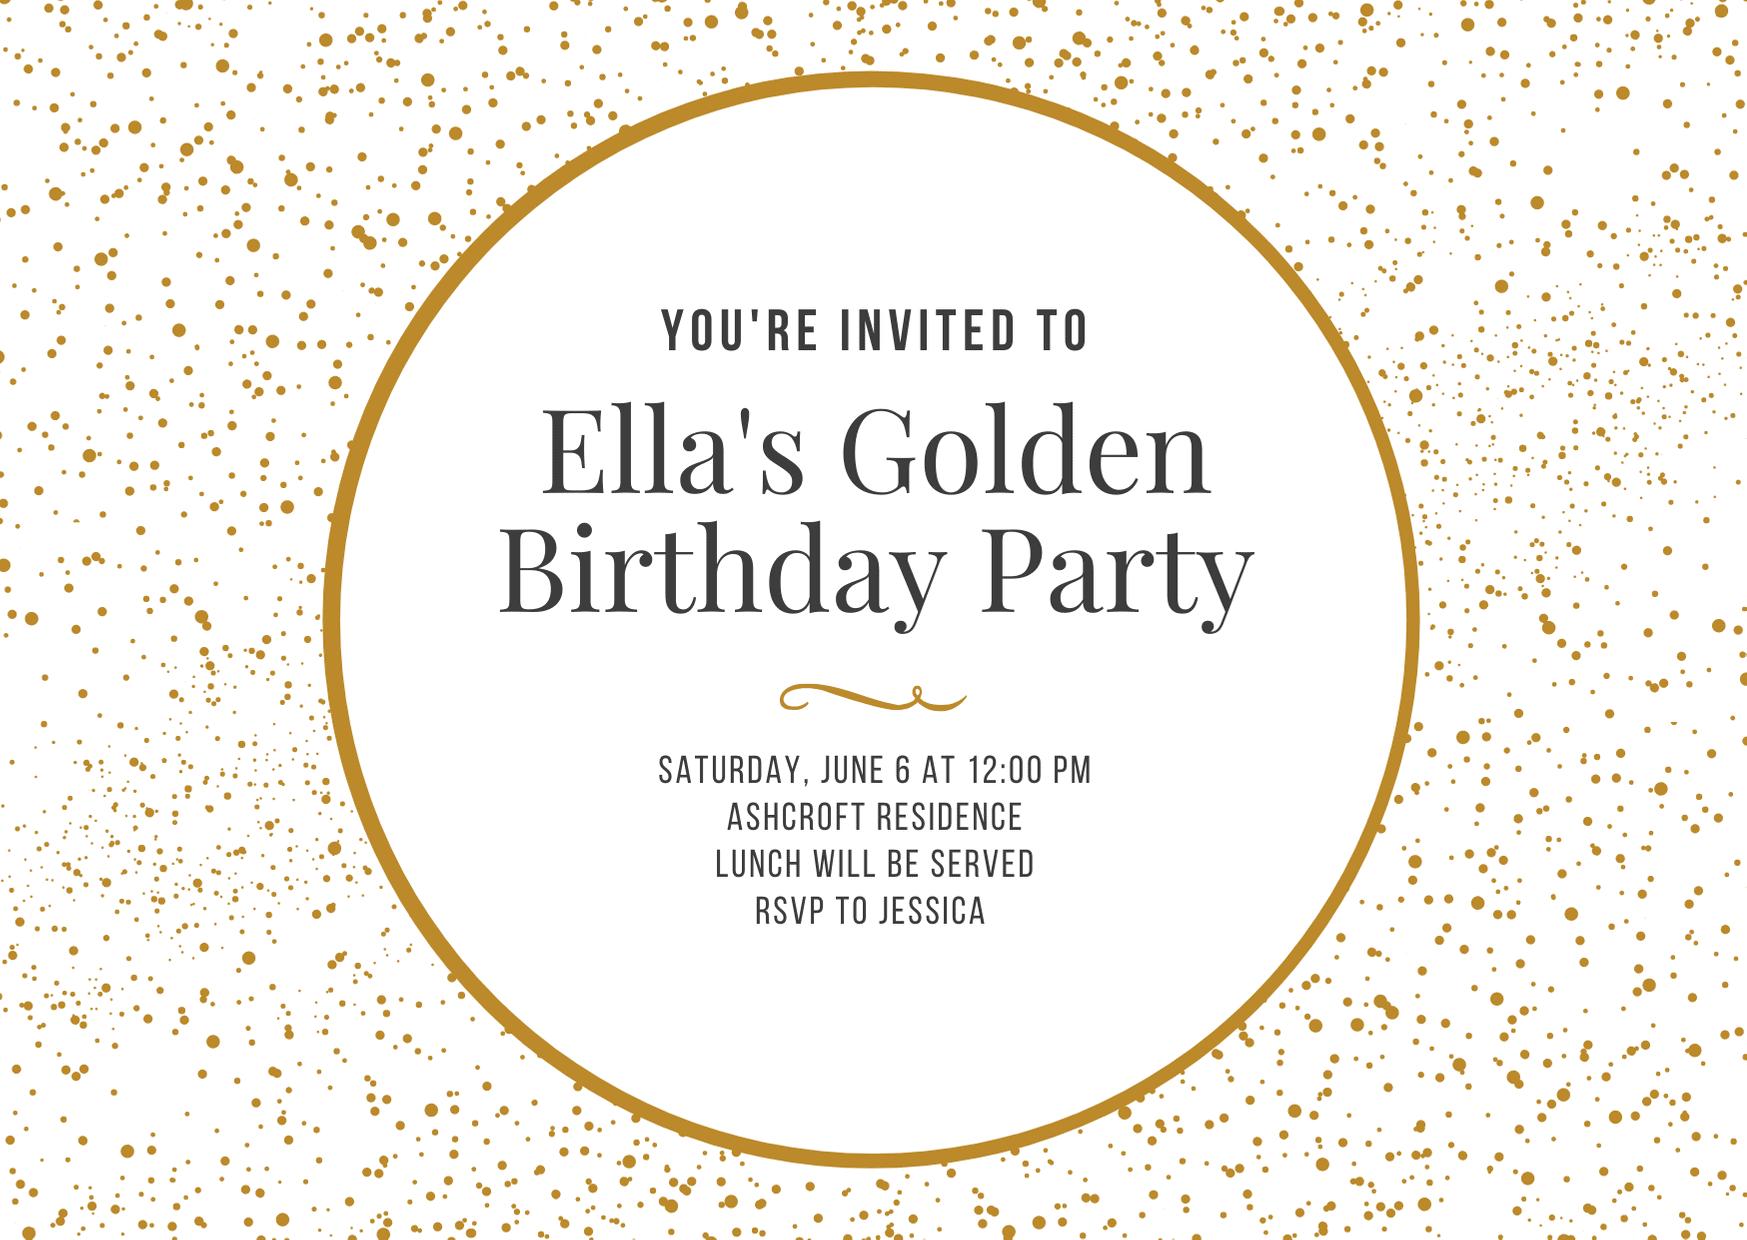 Golden birthday part invitation